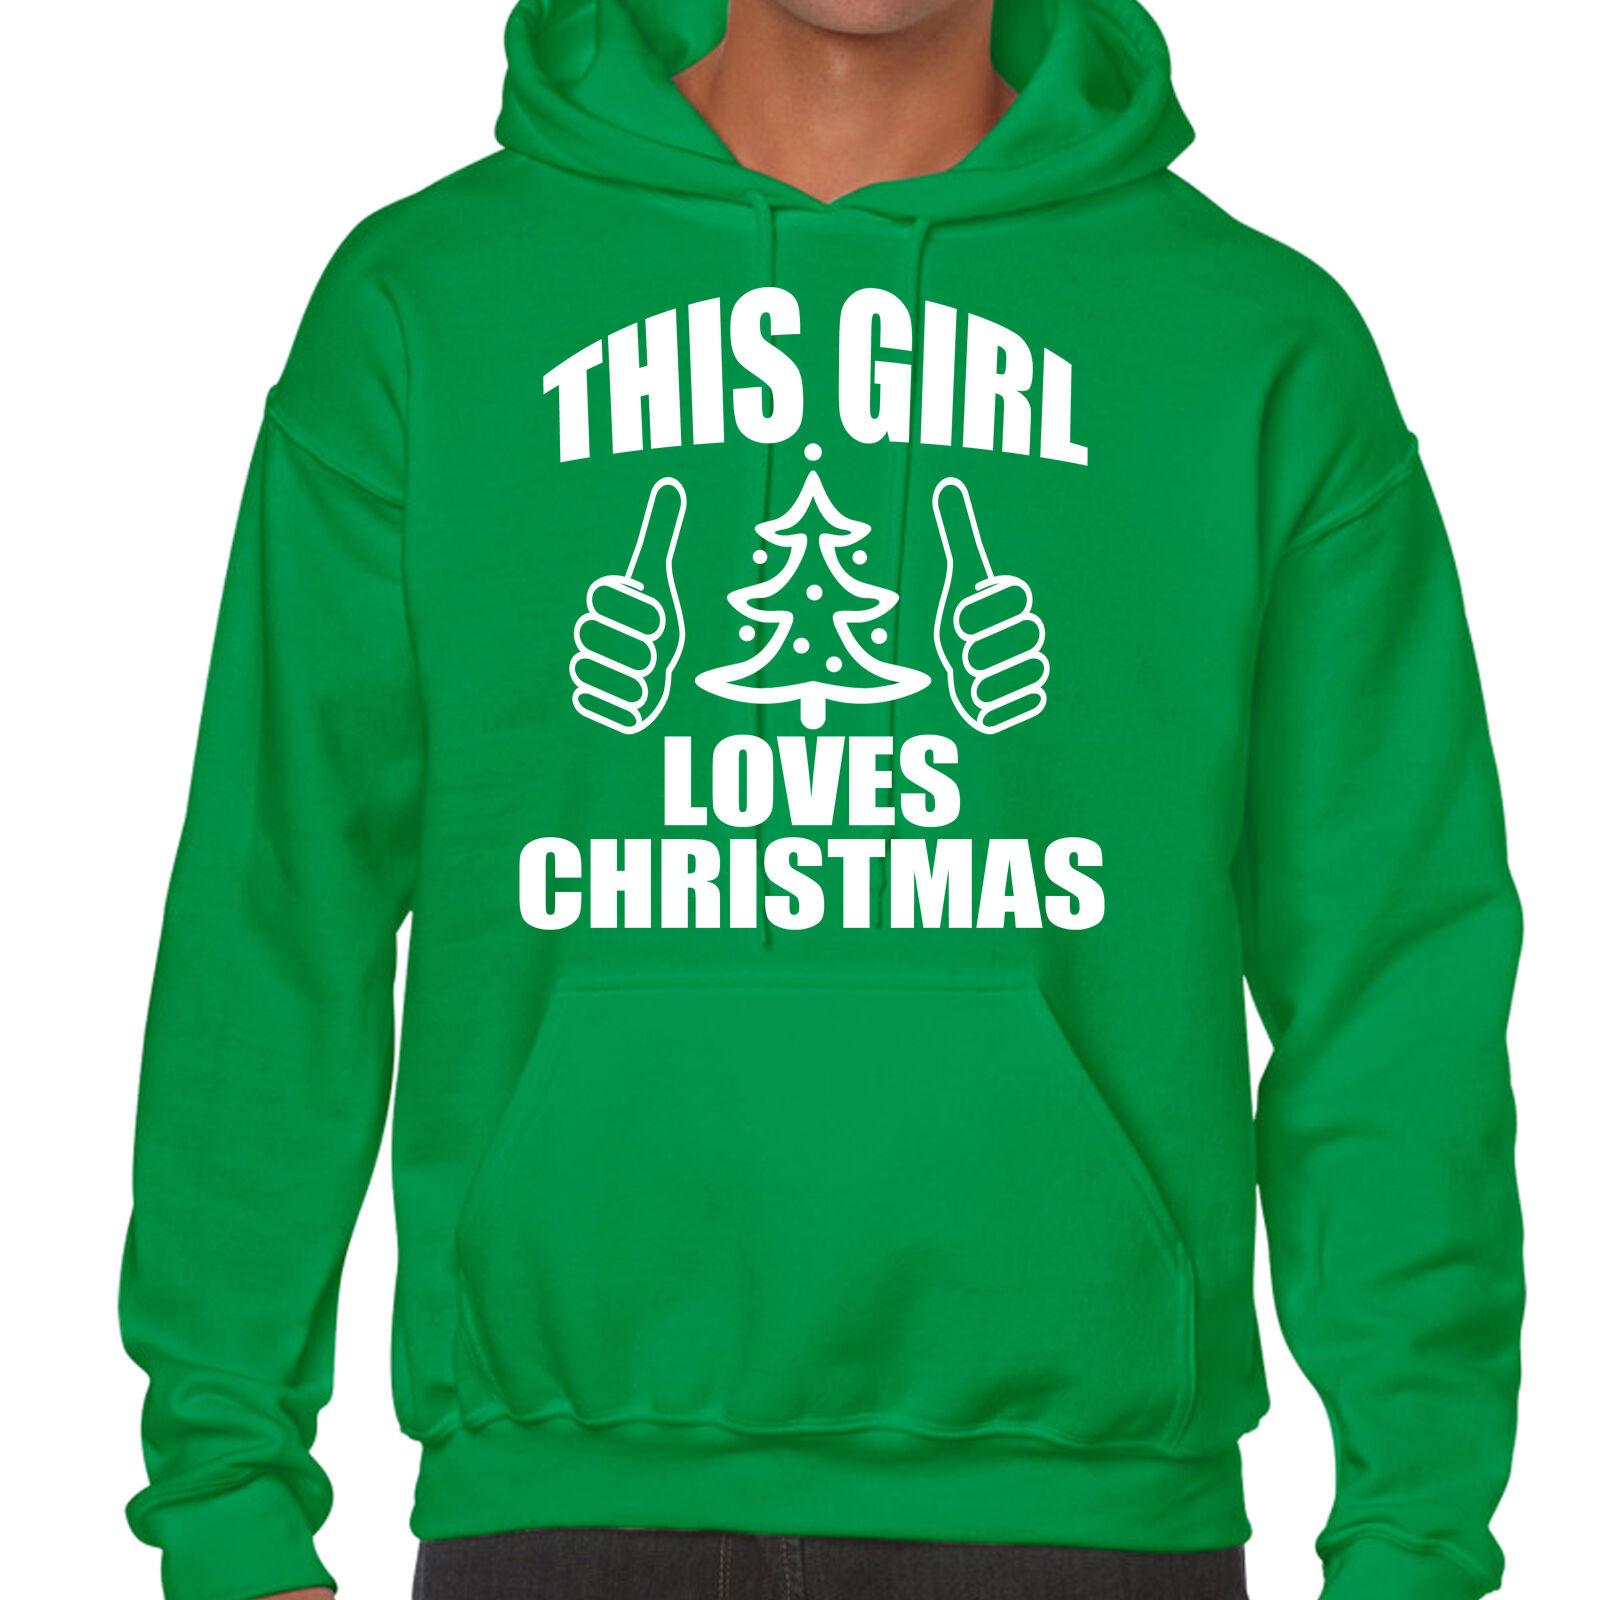 grabmybits - Noël CETTE FILLE Loves Noël - Capuche - Noël pull, tricot, cadeau f3bd56